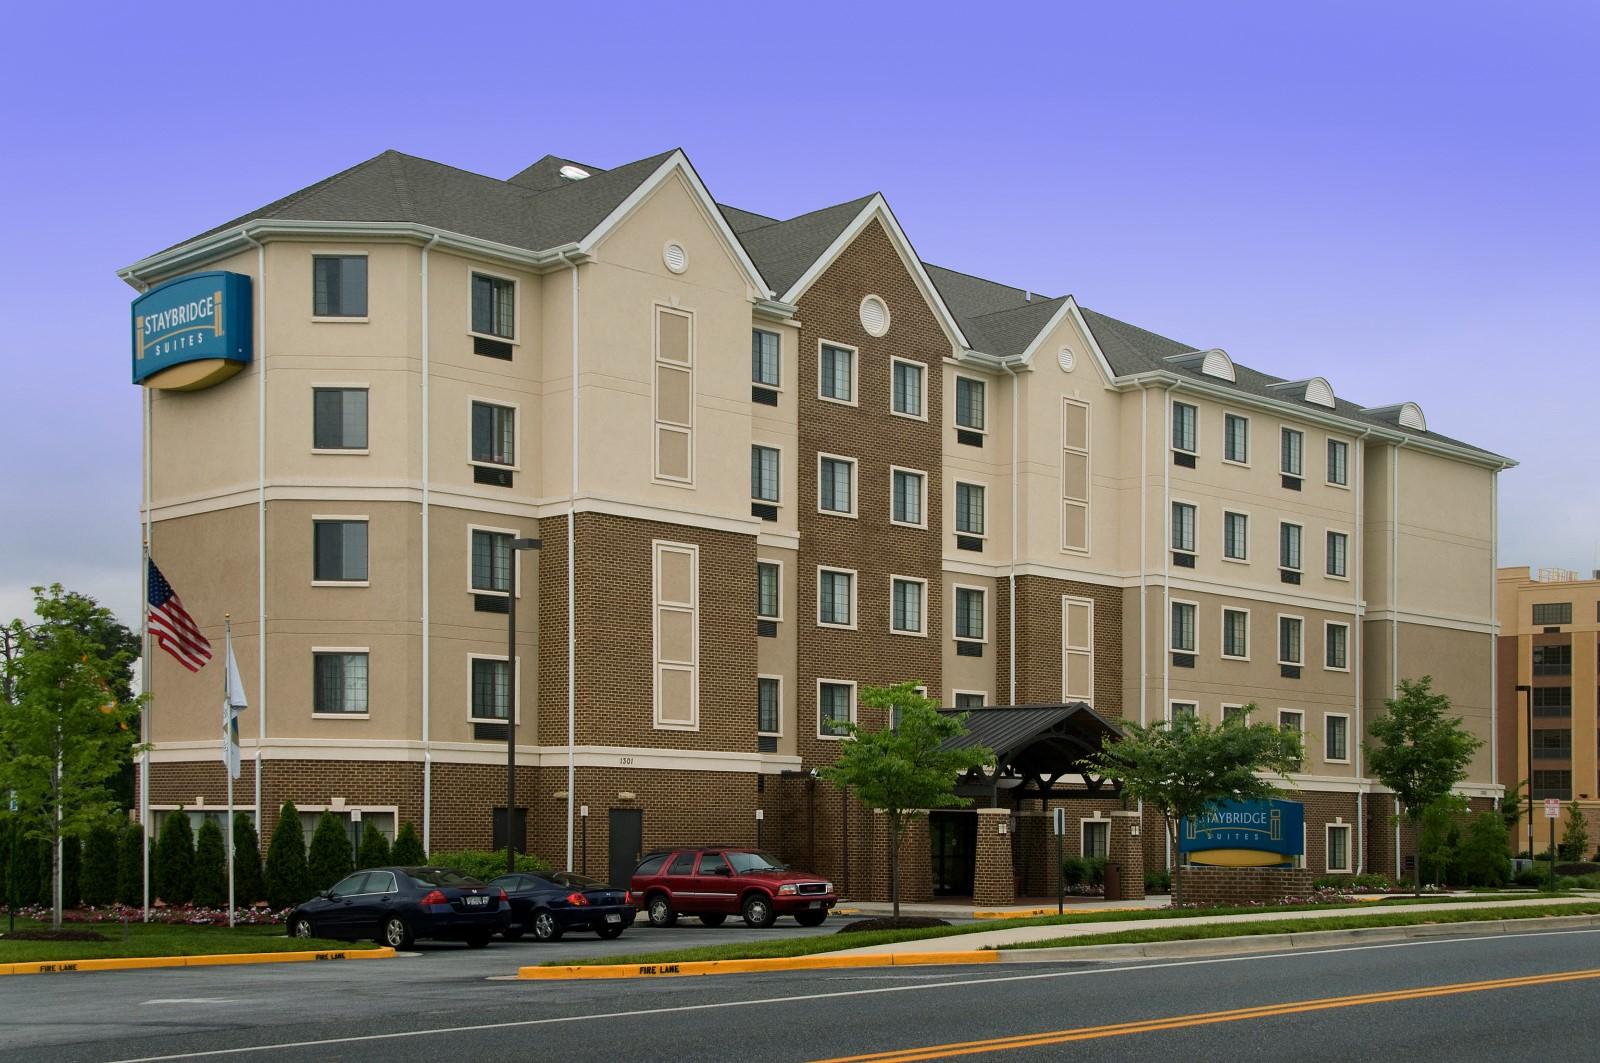 Staybridge Suites Baltimore BWI Airport U2013 Hotel In Baltimore, Maryland U2013  Baltimore Hotels